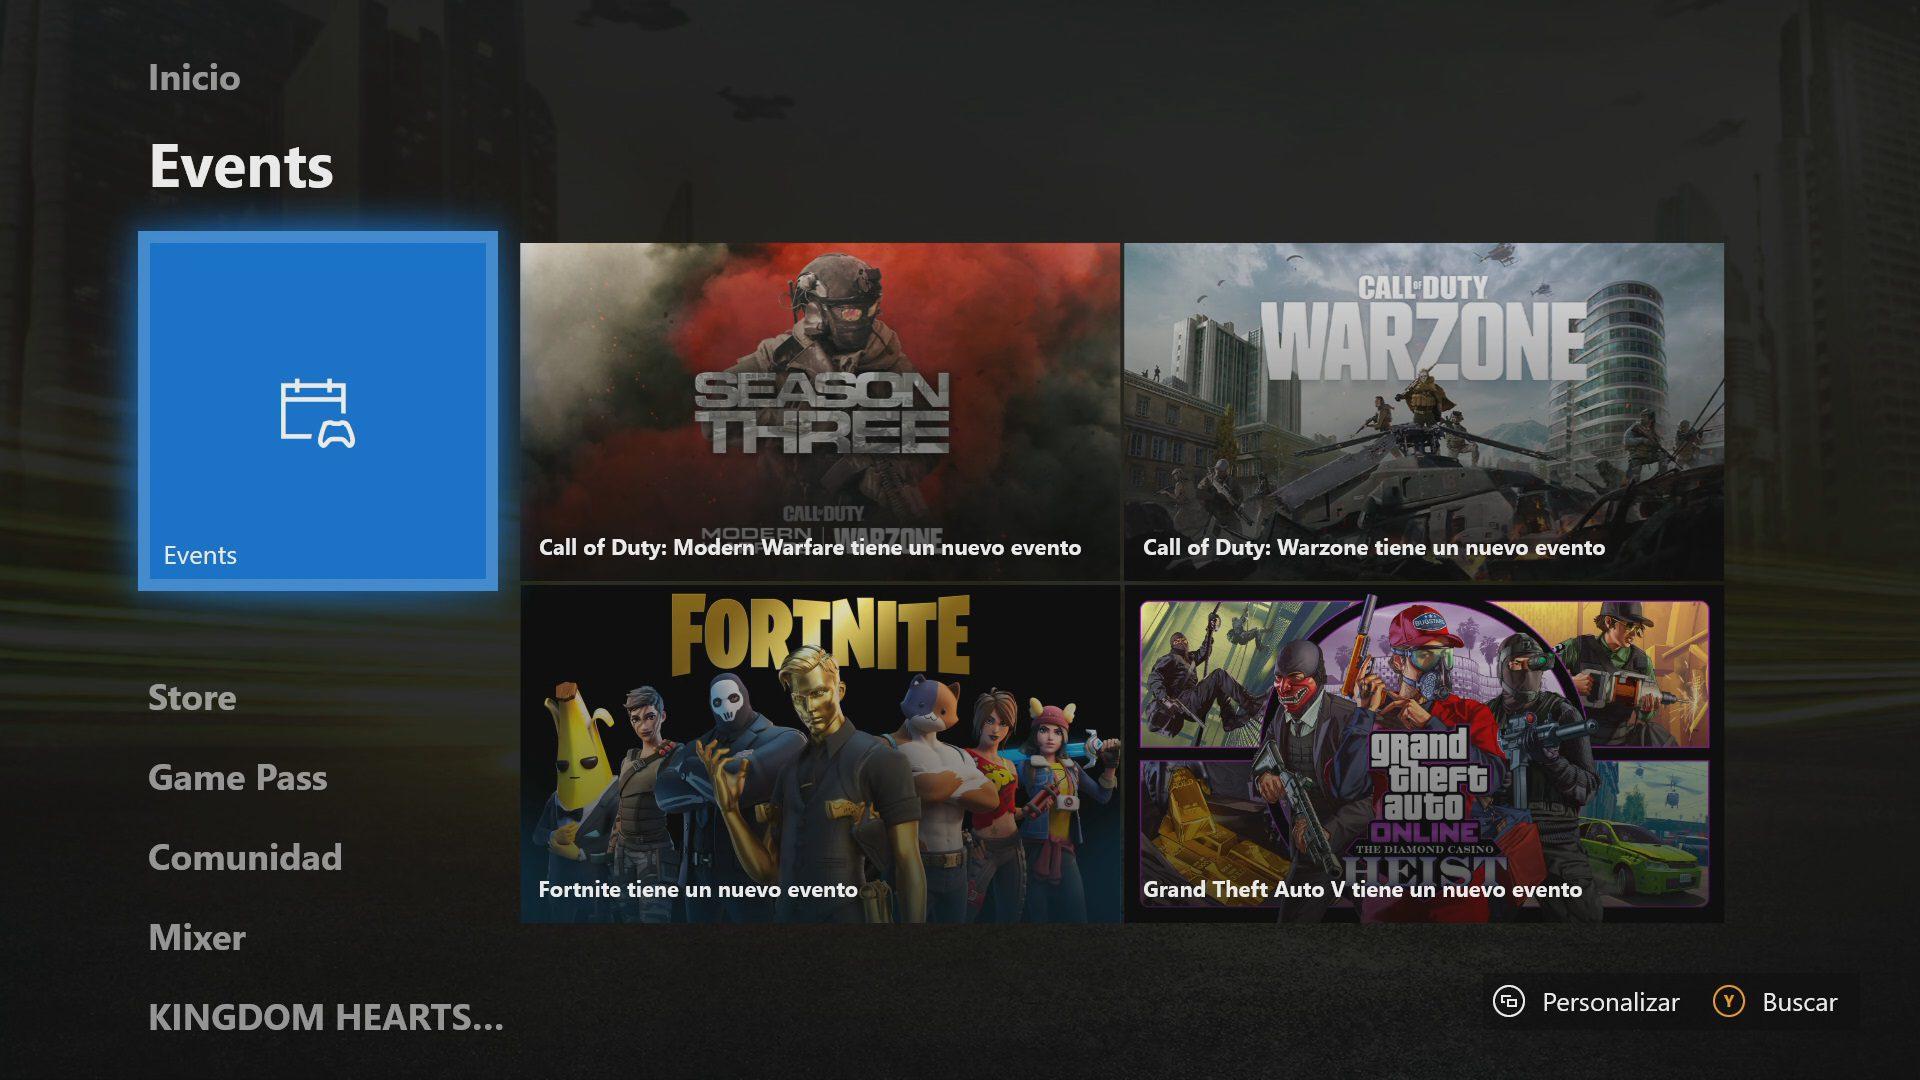 Bloque eventos en Xbox One actualización de mayo 2020